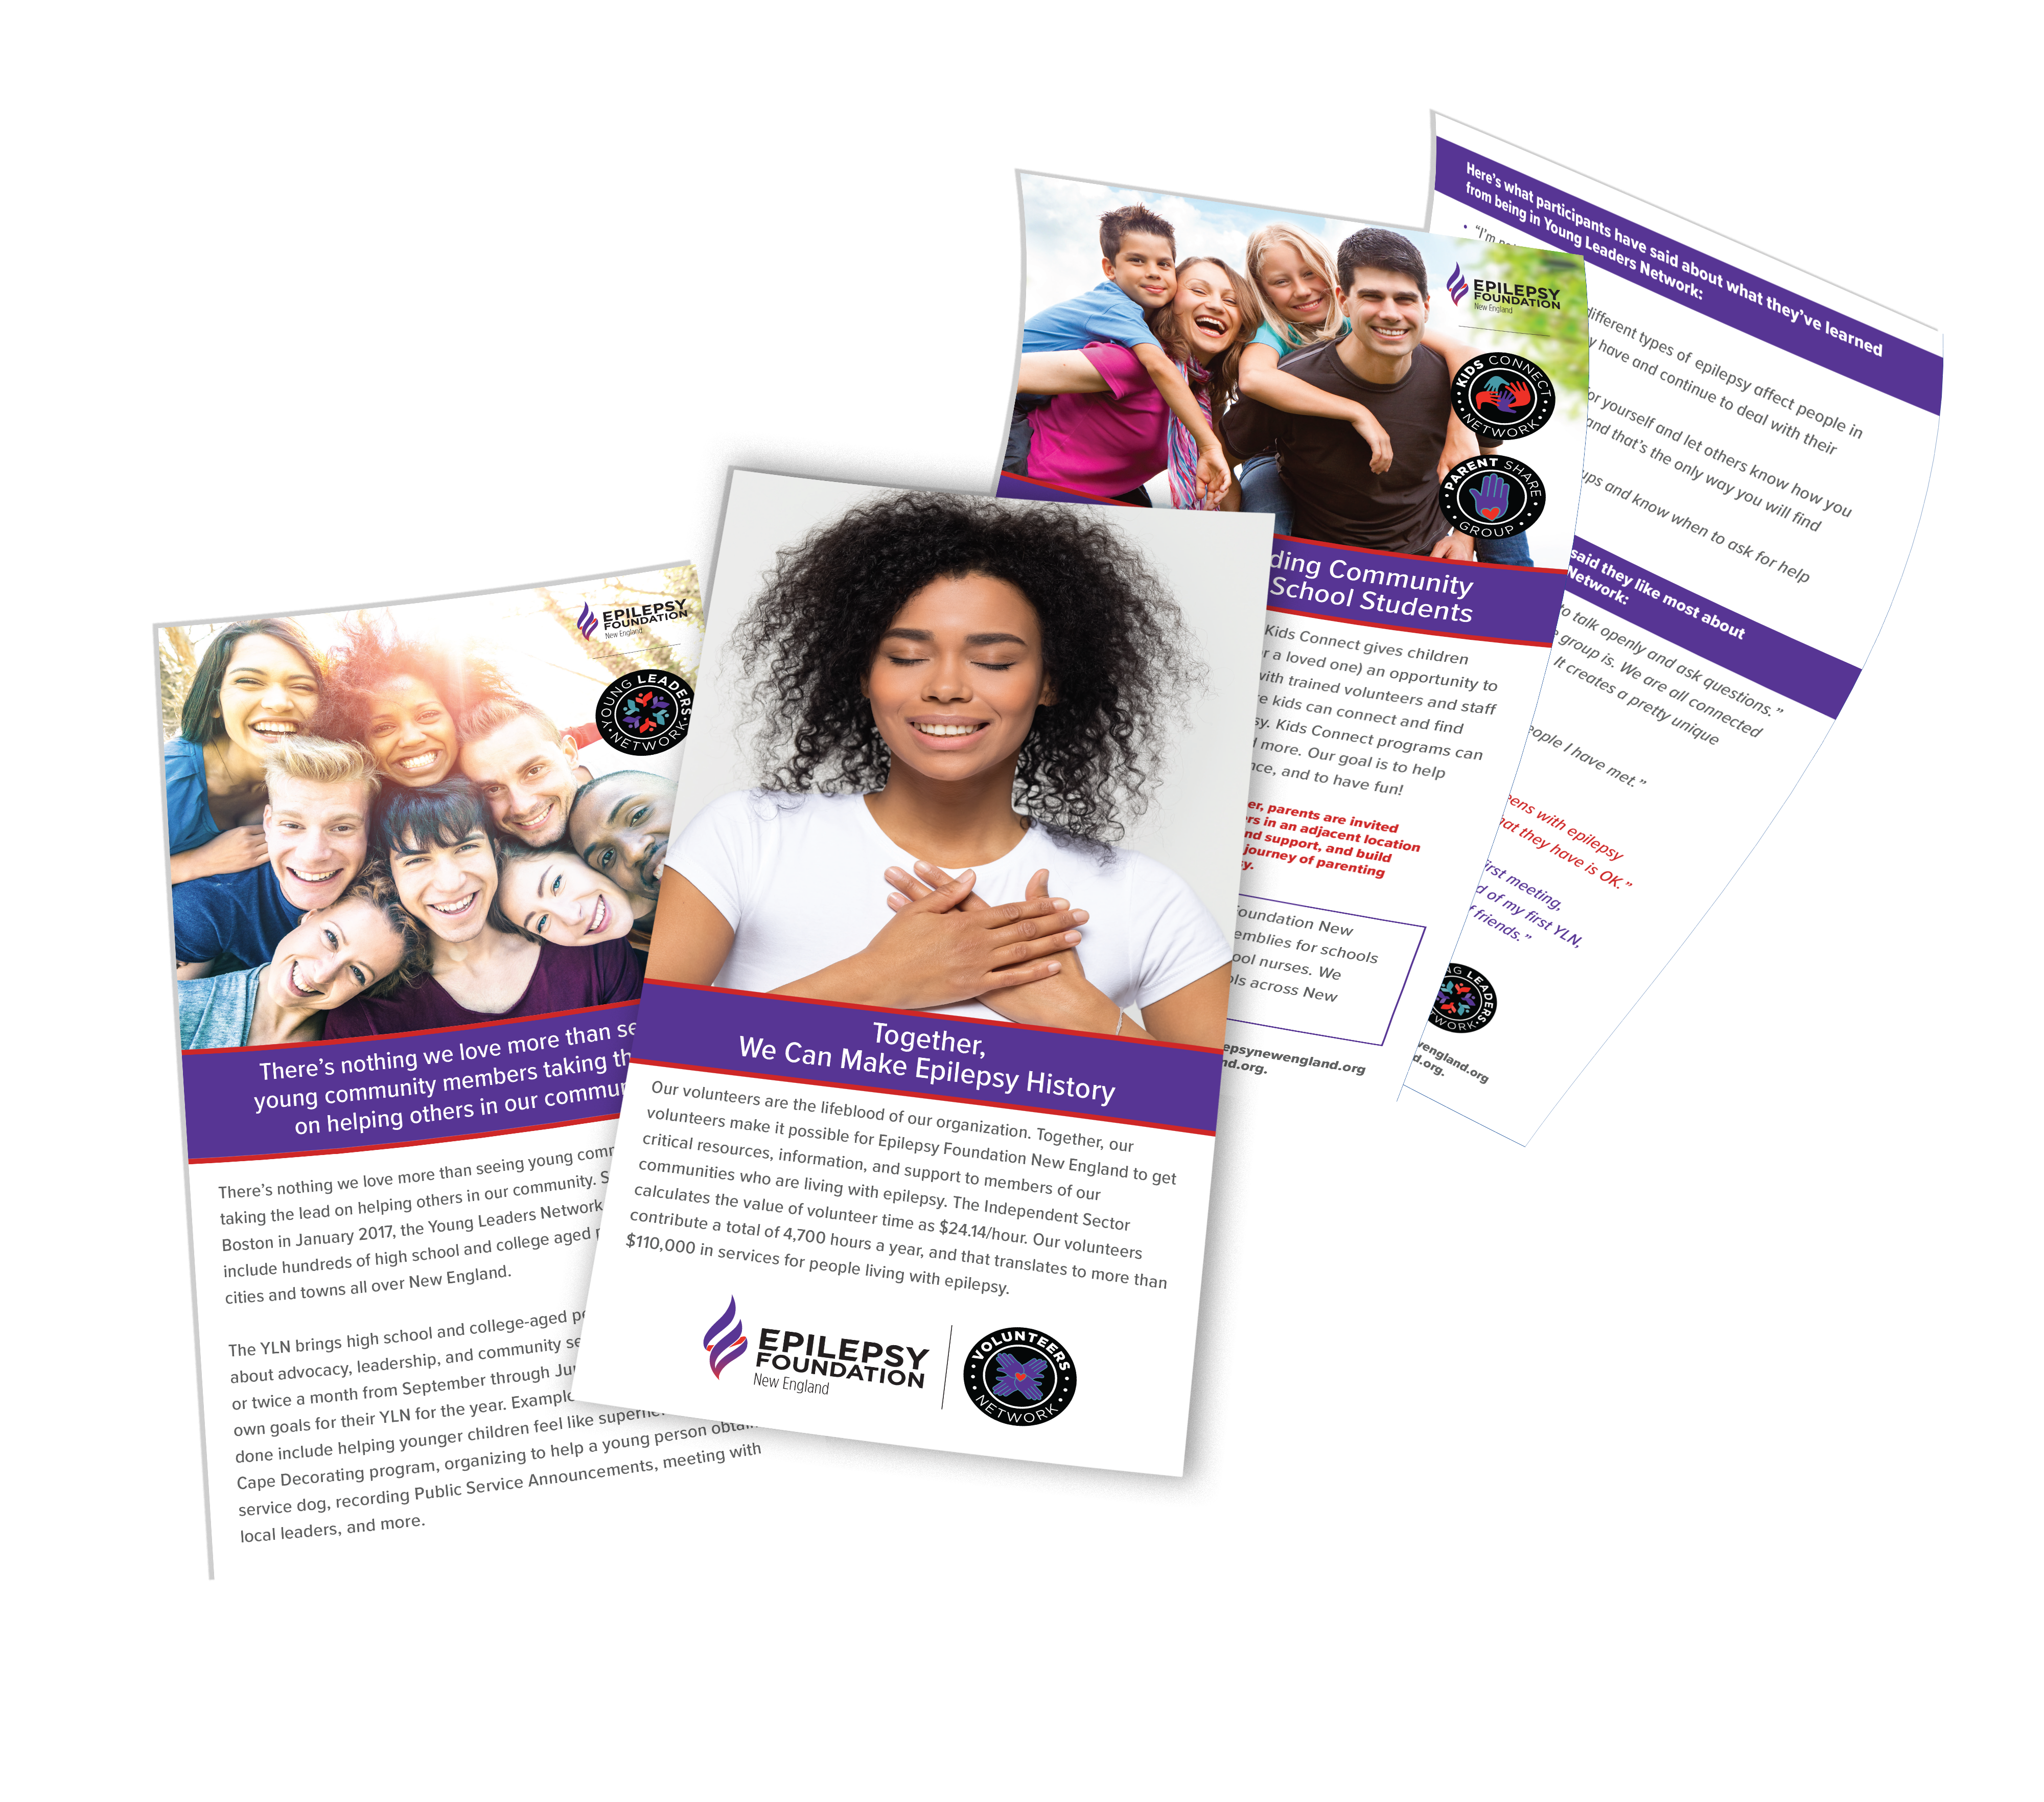 epilepsy foundation brochure designs